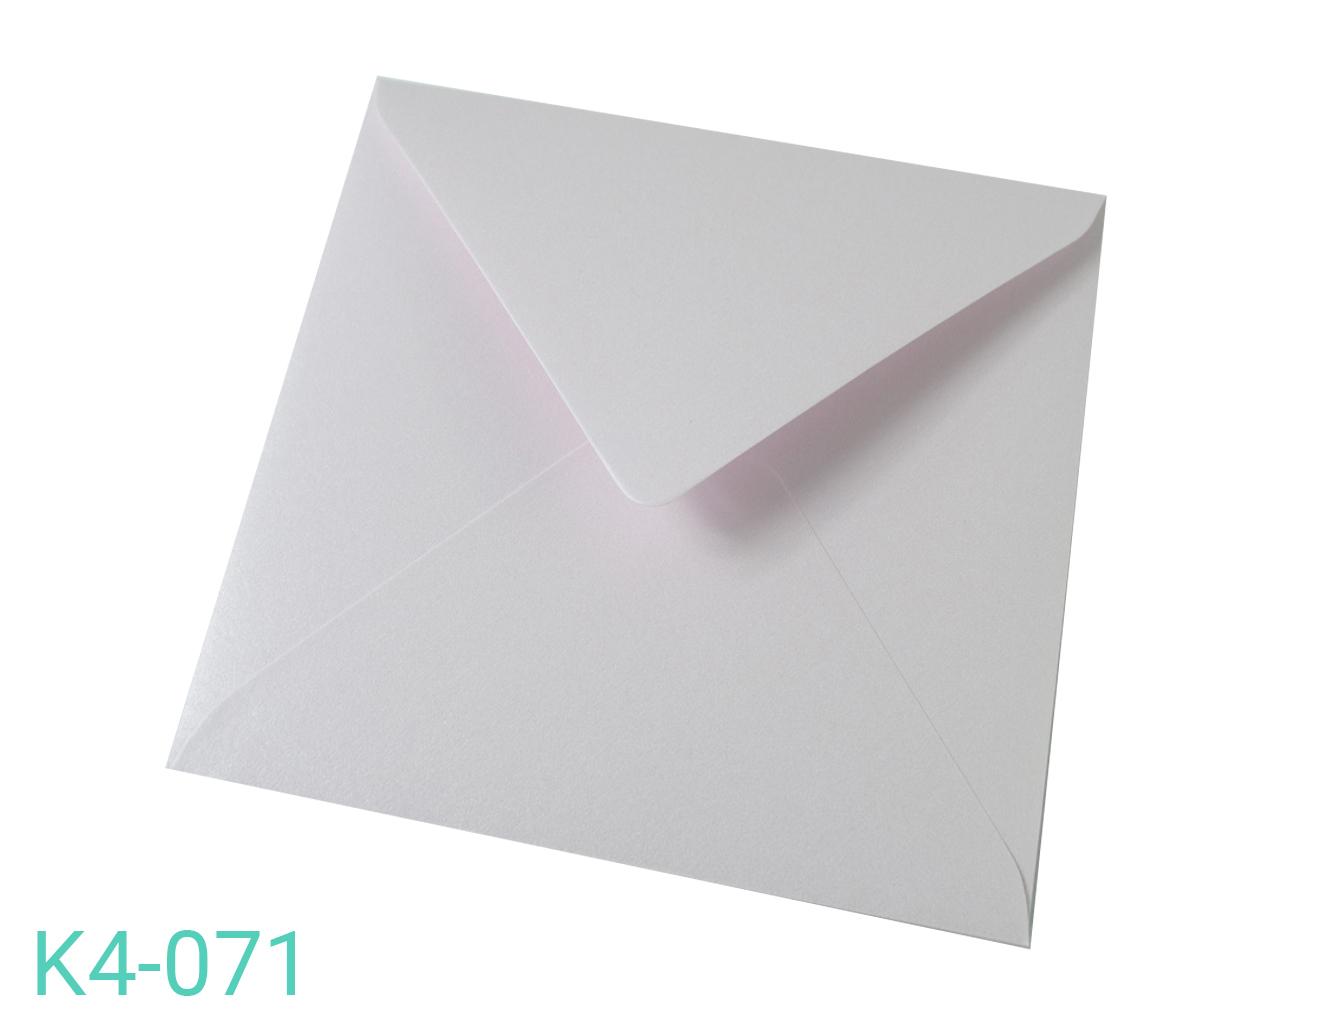 Koperta K4-071